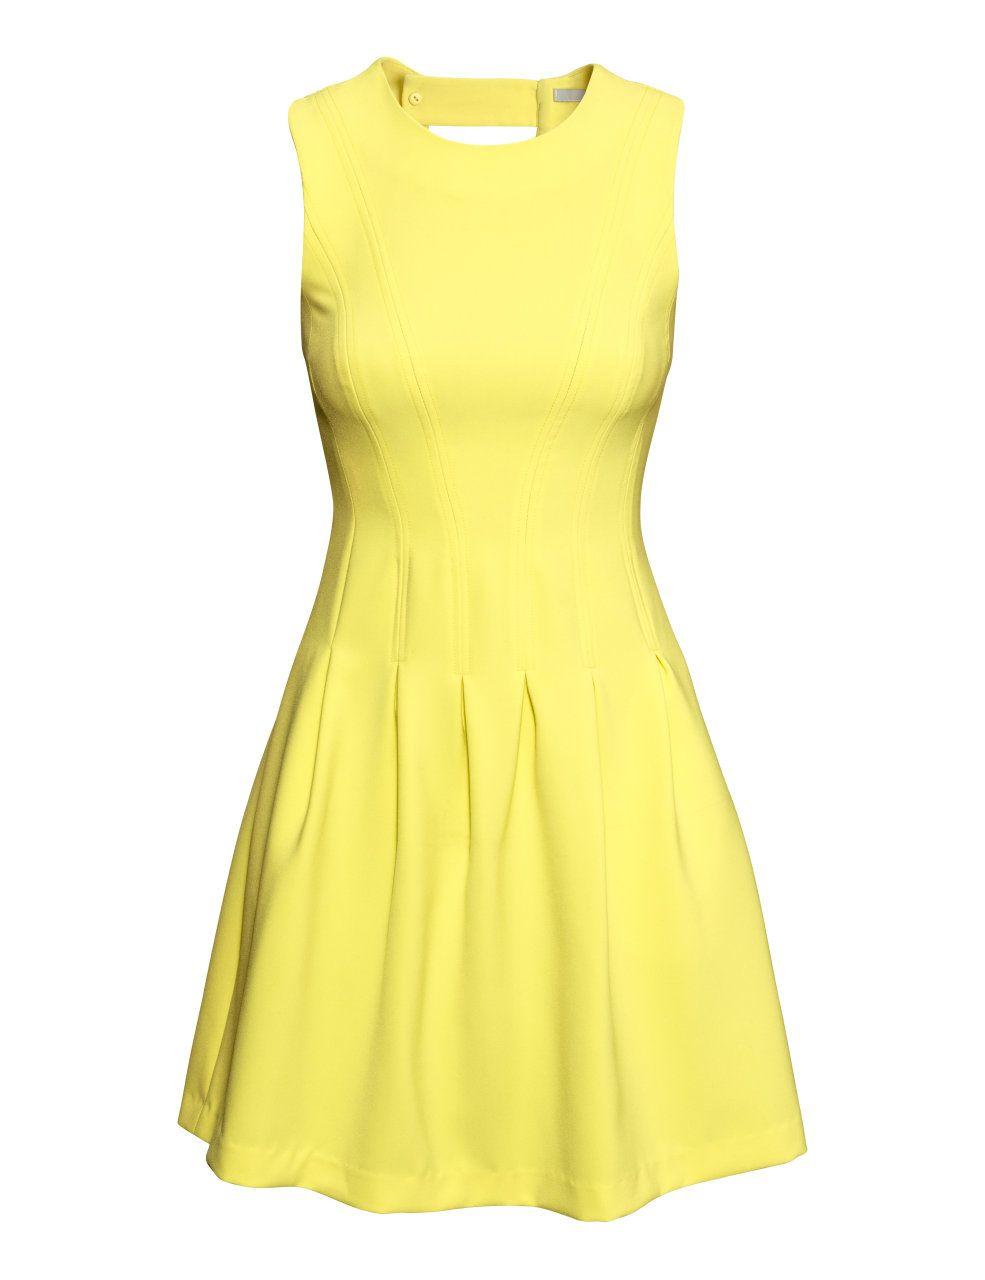 H&M Ärmelloses Kleid 39,99 | Mode outfits frauen, Gelbe ...